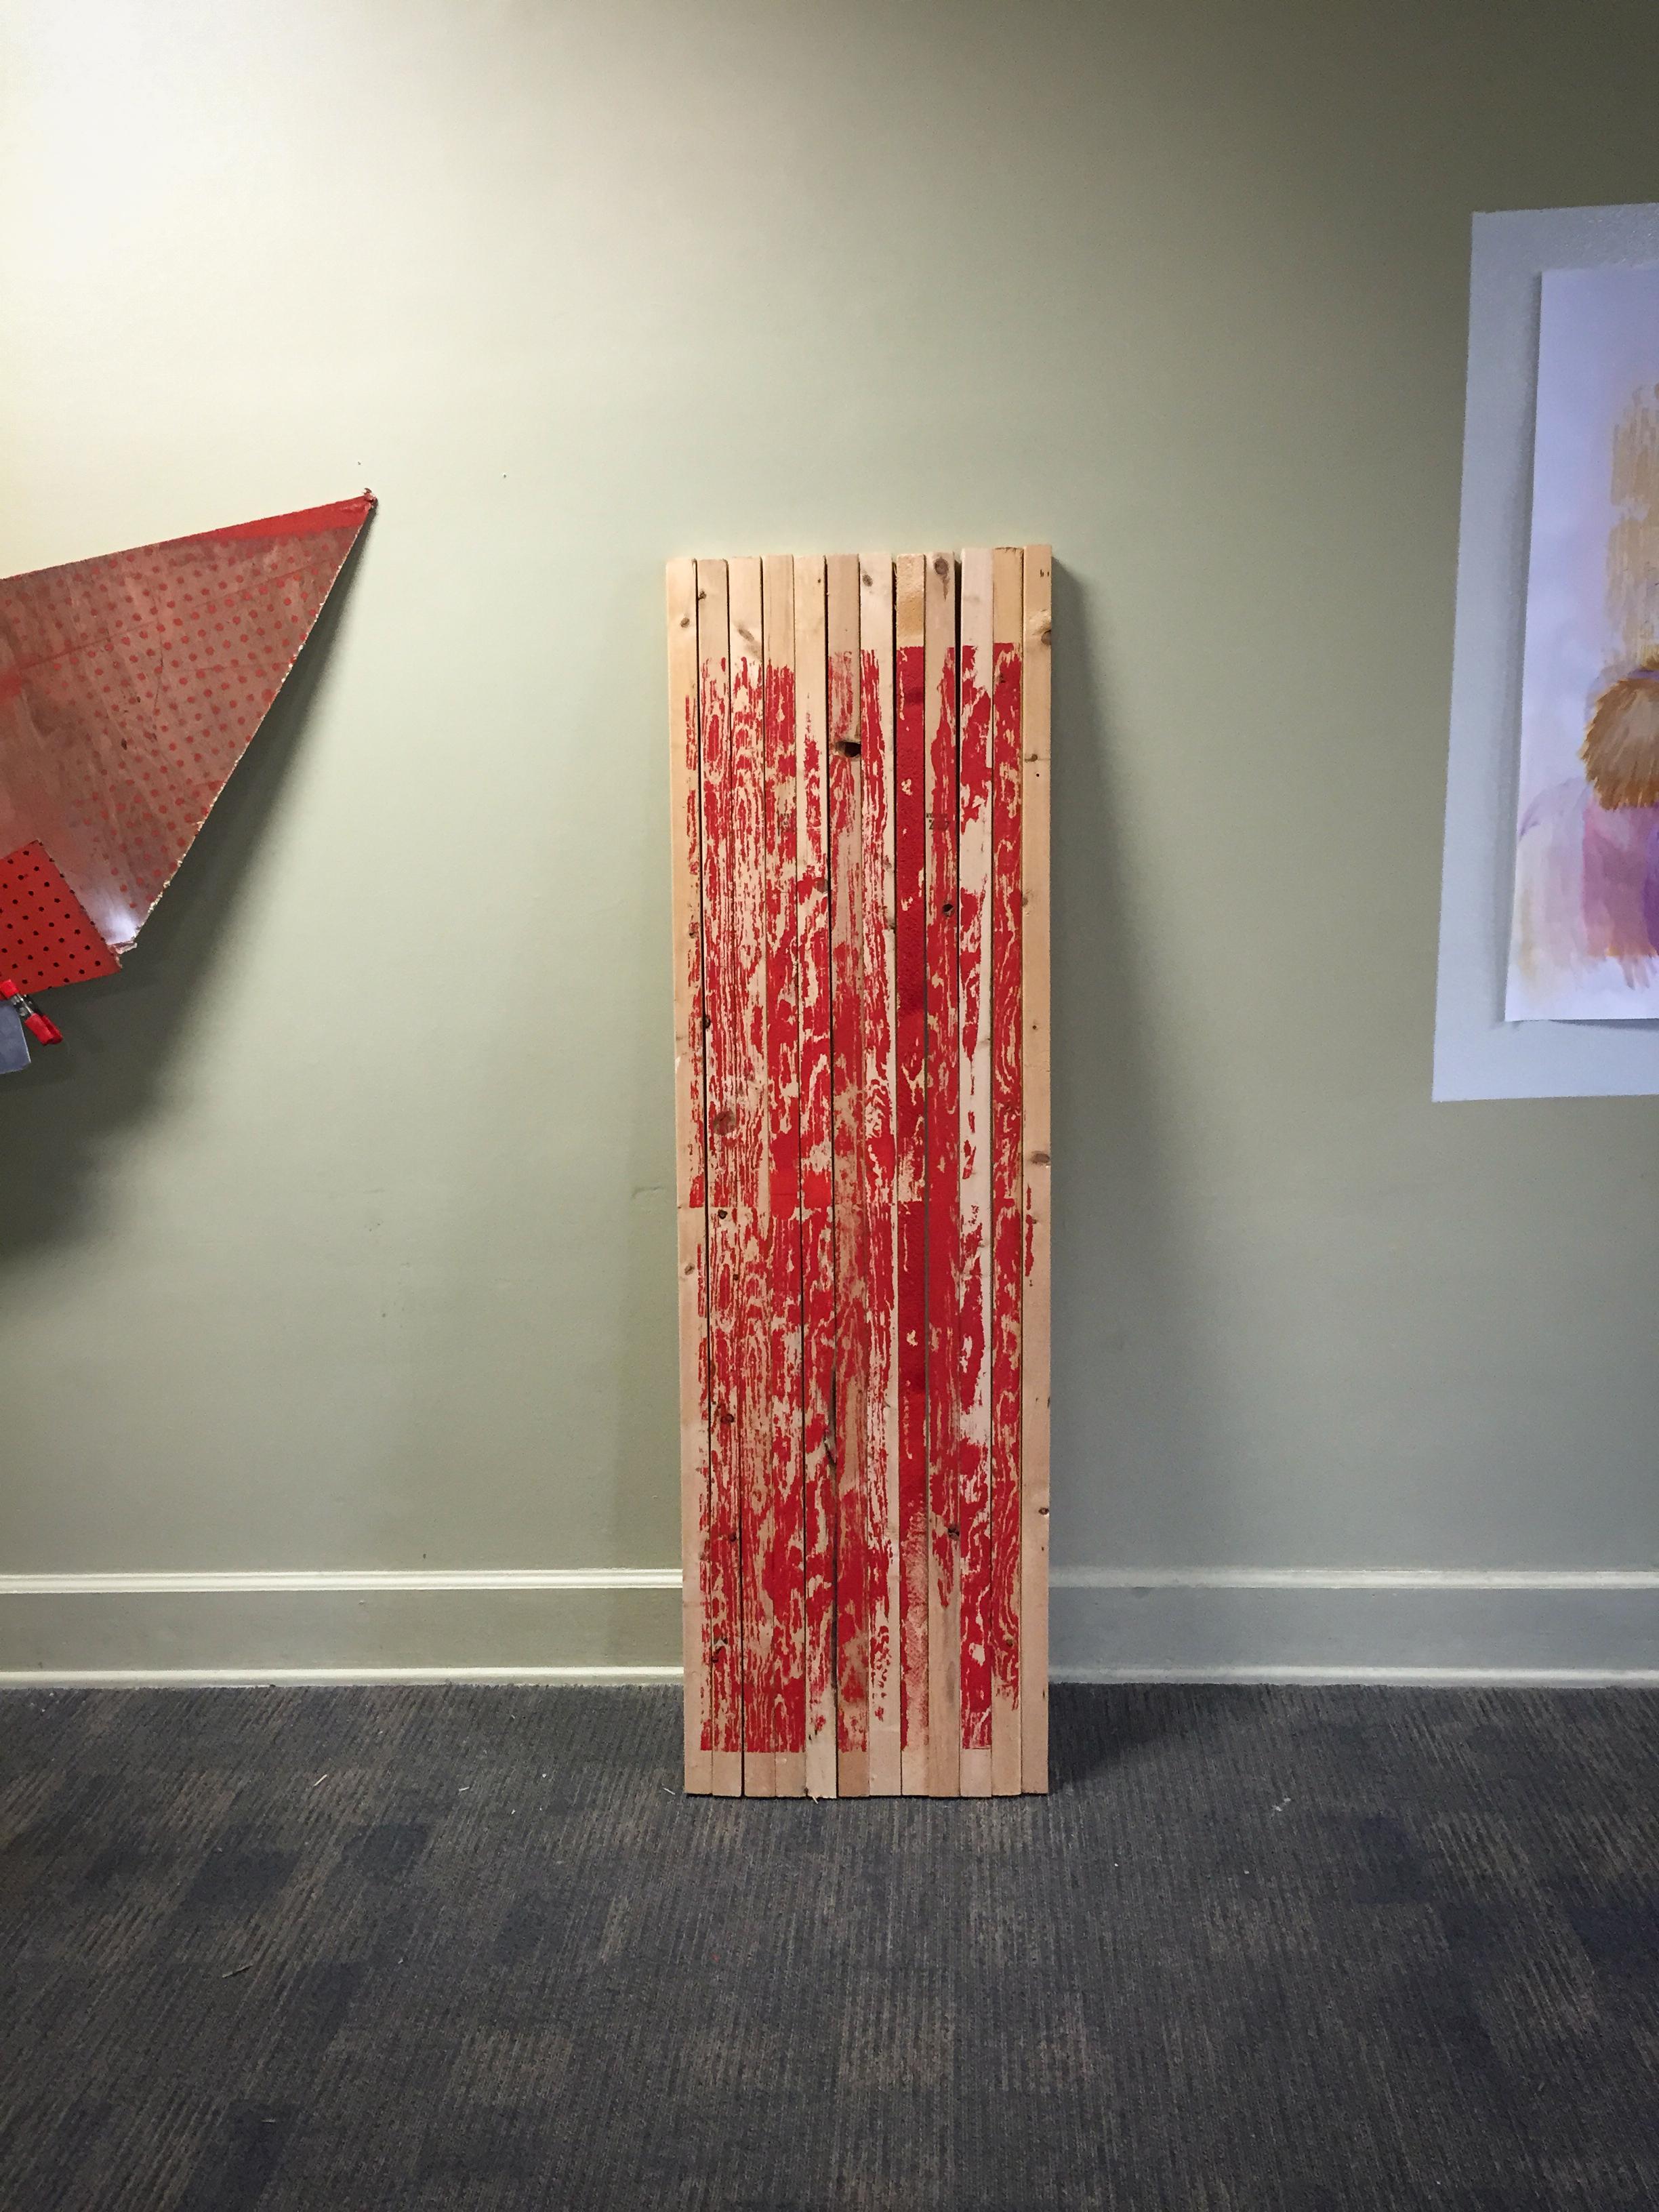 Stretcher , screen print on wood